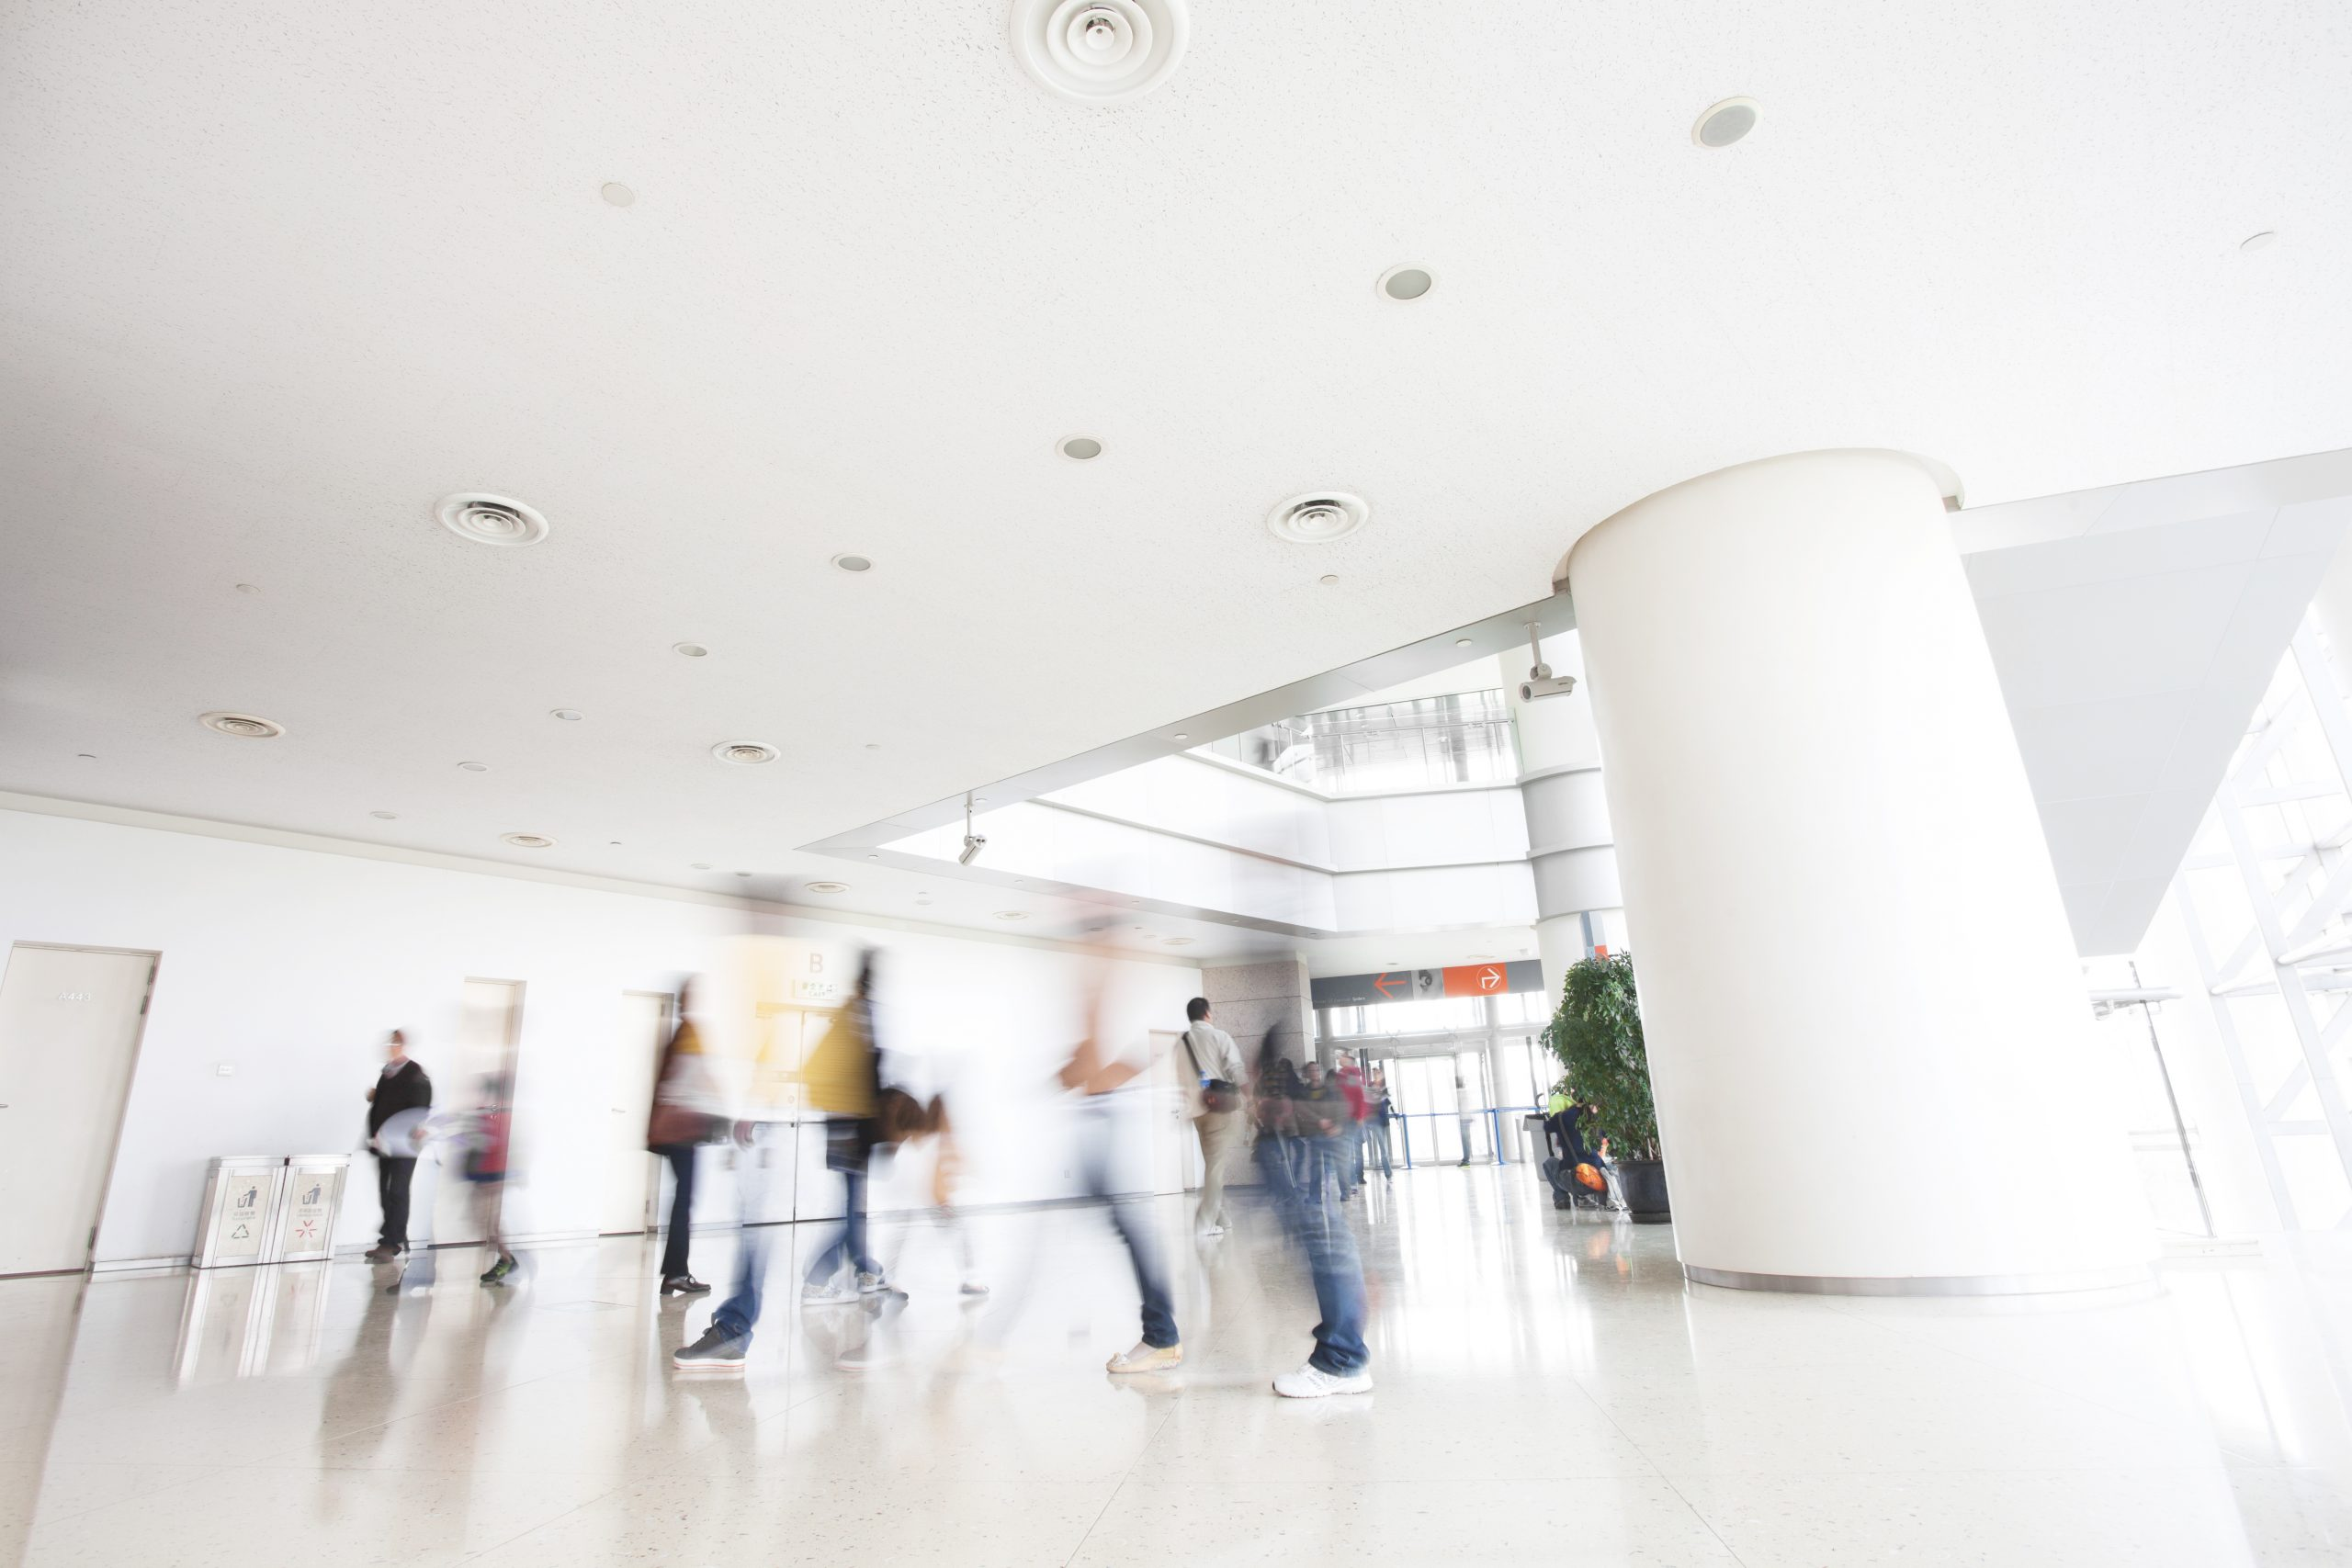 Folk i bevegelse i moderne bygninger